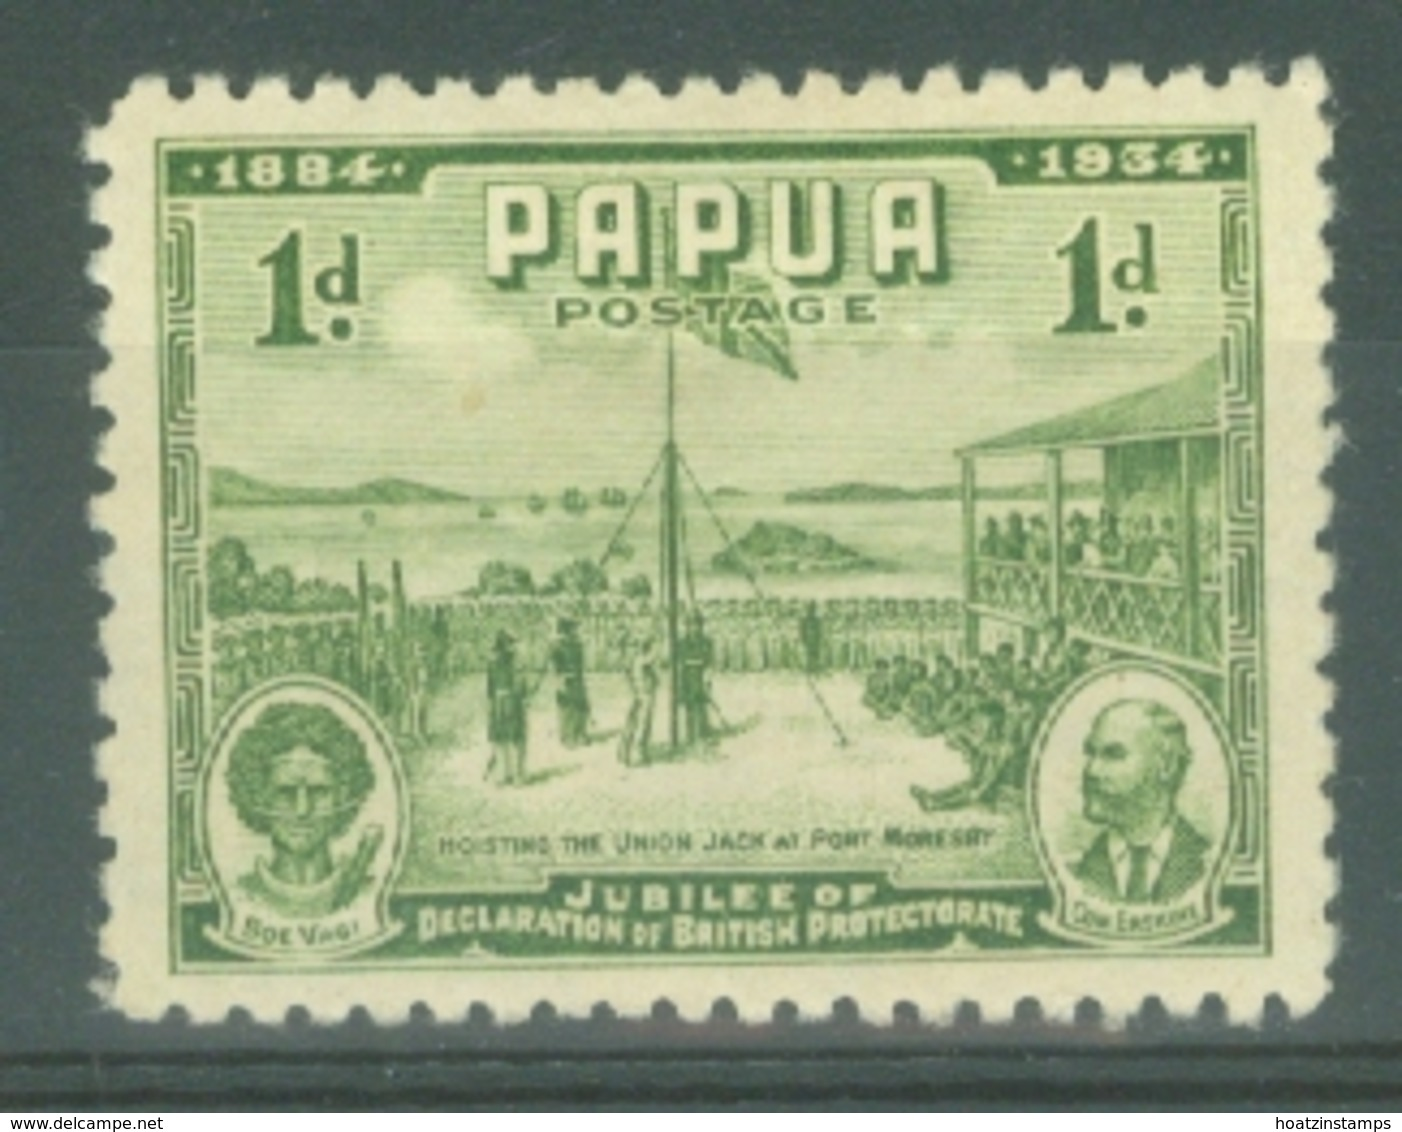 Papua New Guinea: 1934   50th Anniv Of Declaration Of British Protectorate    SG146    1d     MH - Papua New Guinea